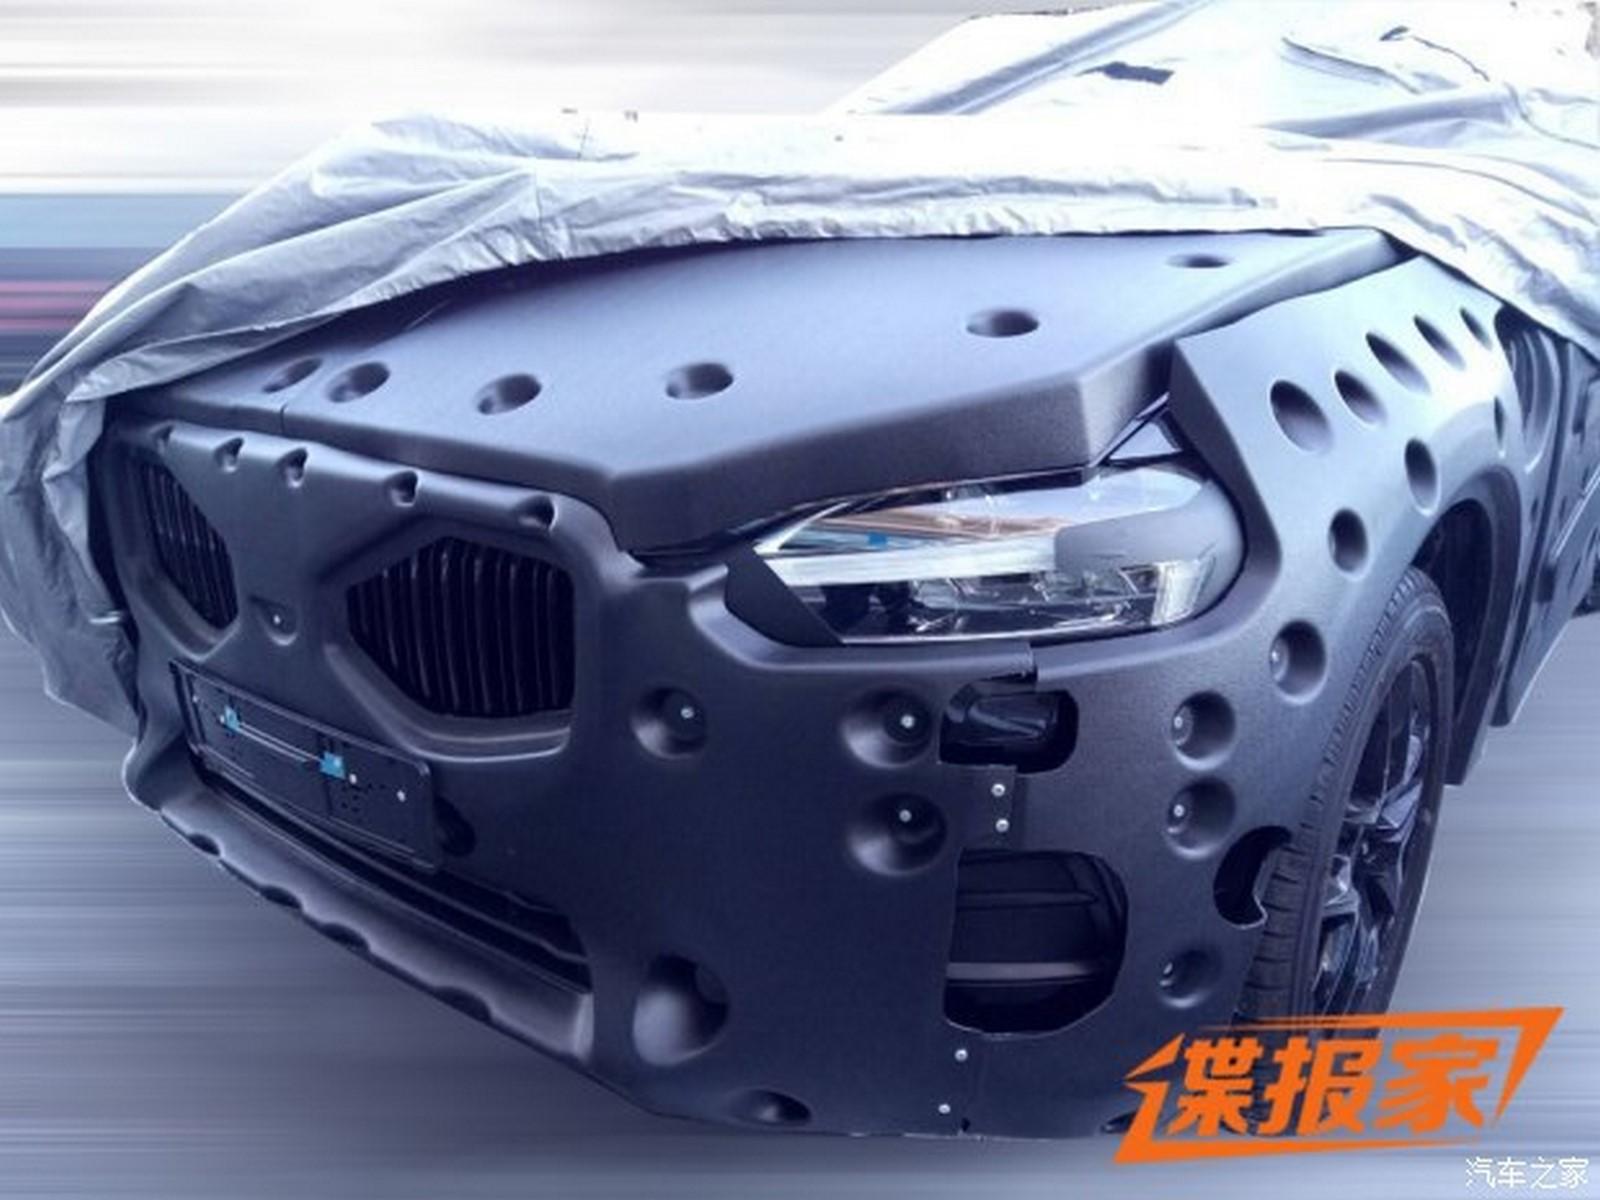 Nowe Volvo XC60 2017 spy